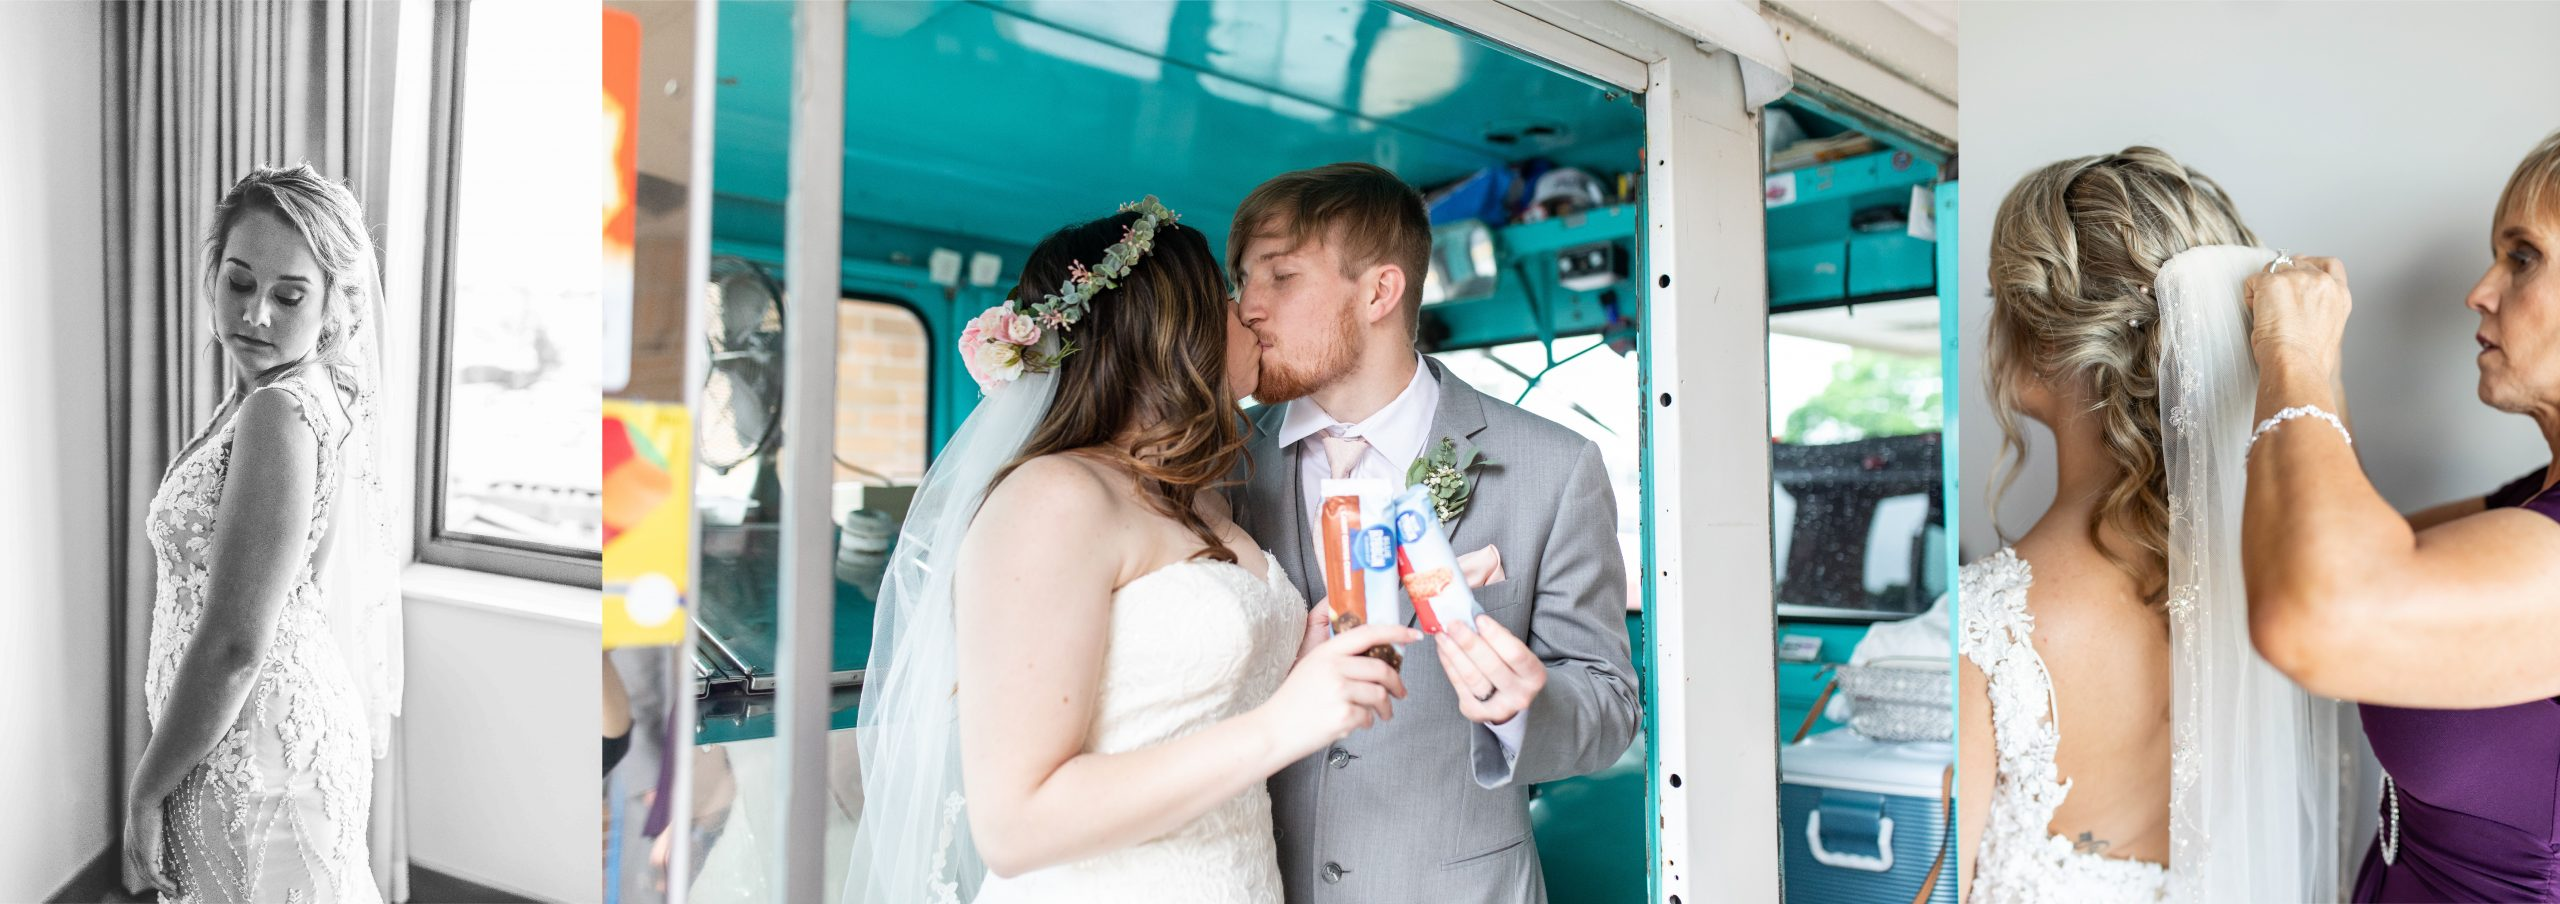 kandra-lynn-photography-michigan-wedding-photographer-17